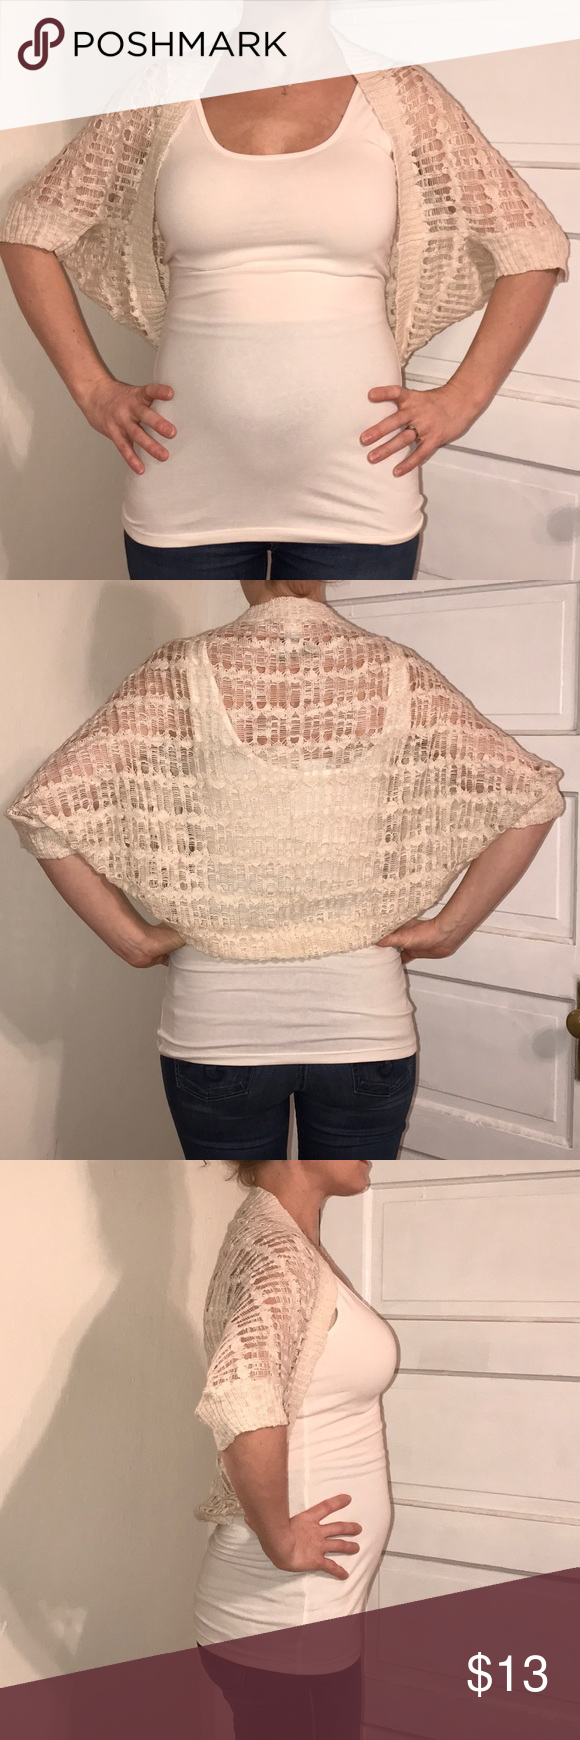 Cream colored shawl shrug cardigan size M Simple and classy shrug ...